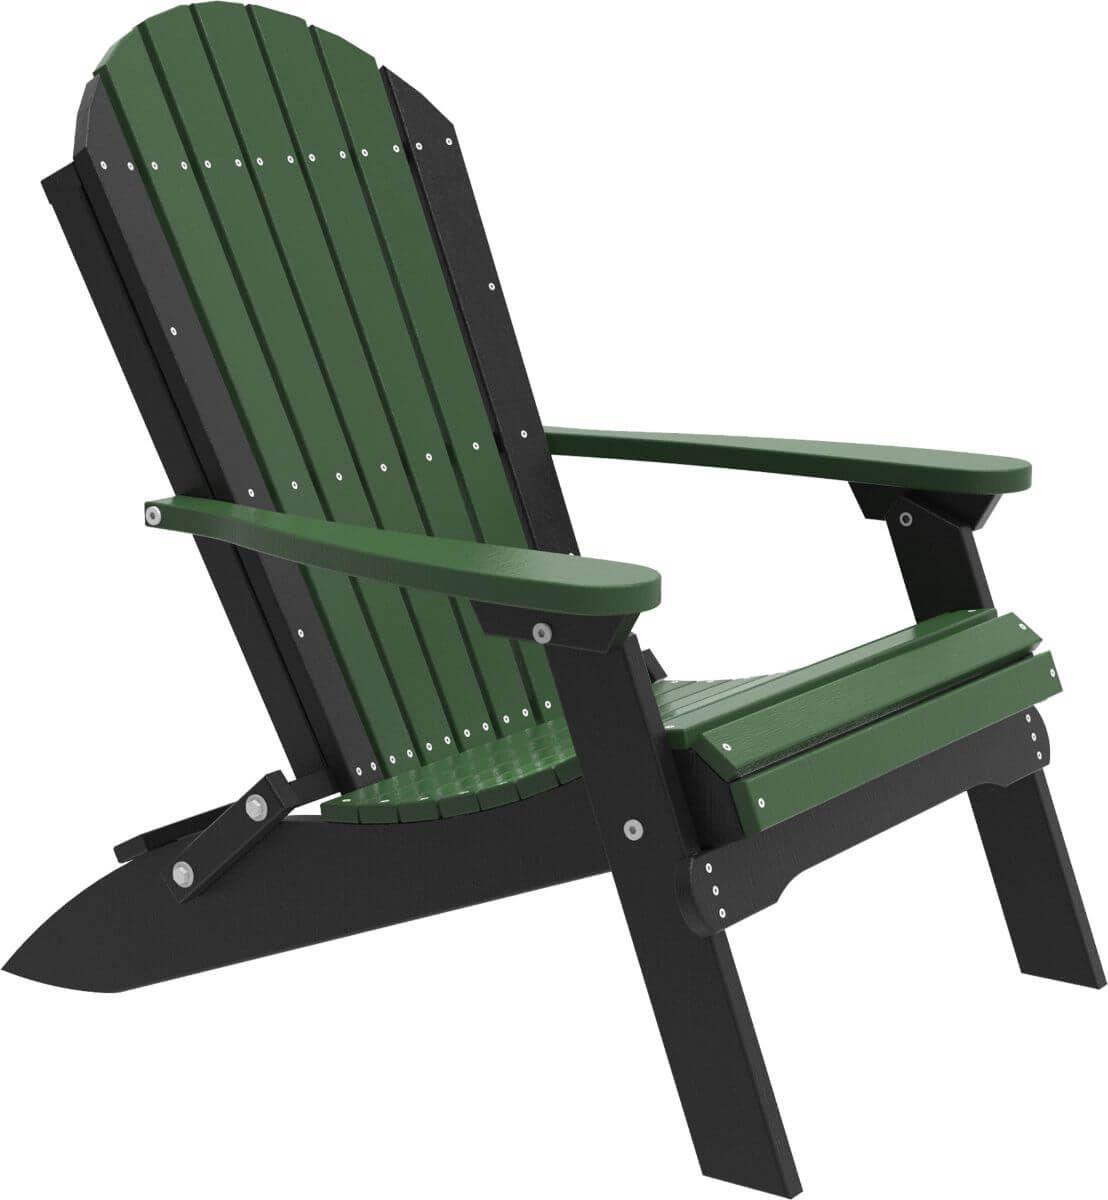 Green and Black Tahiti Folding Adirondack Chair